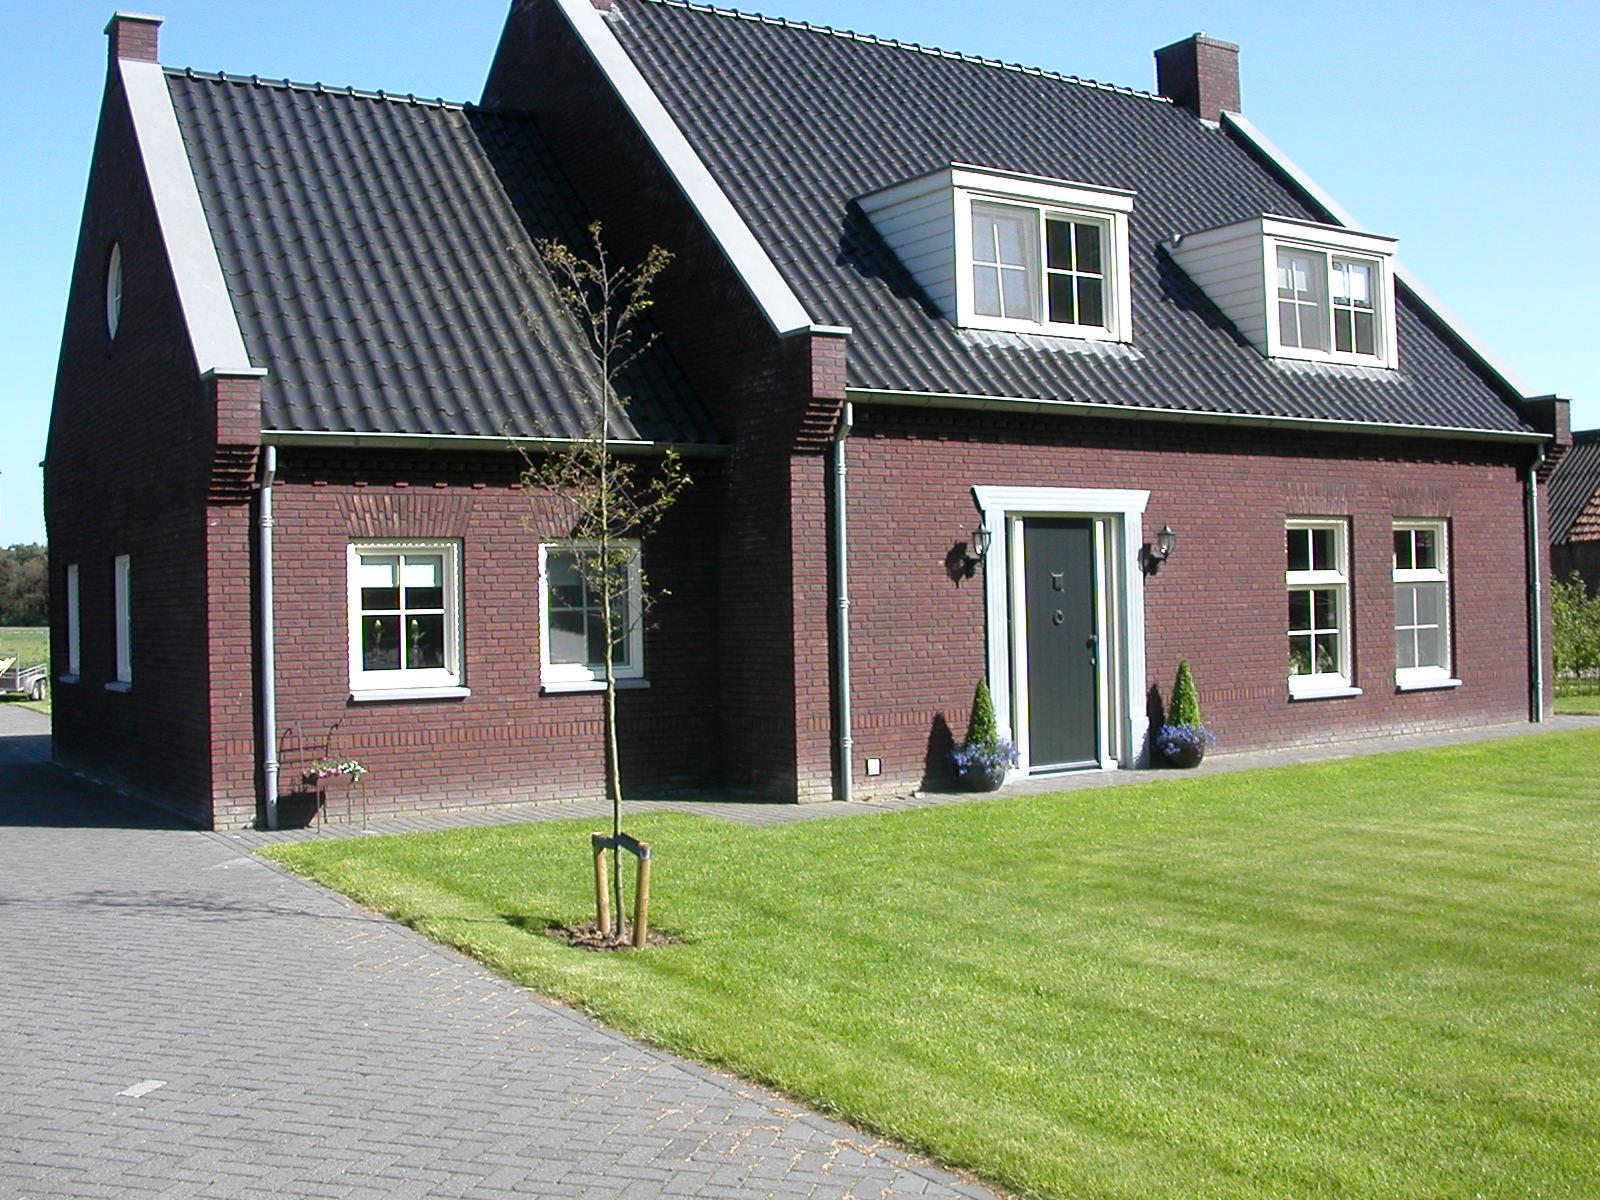 https://www.leonpeterskozijnen.nl/wp-content/uploads/2015/05/DSCN5503.jpg